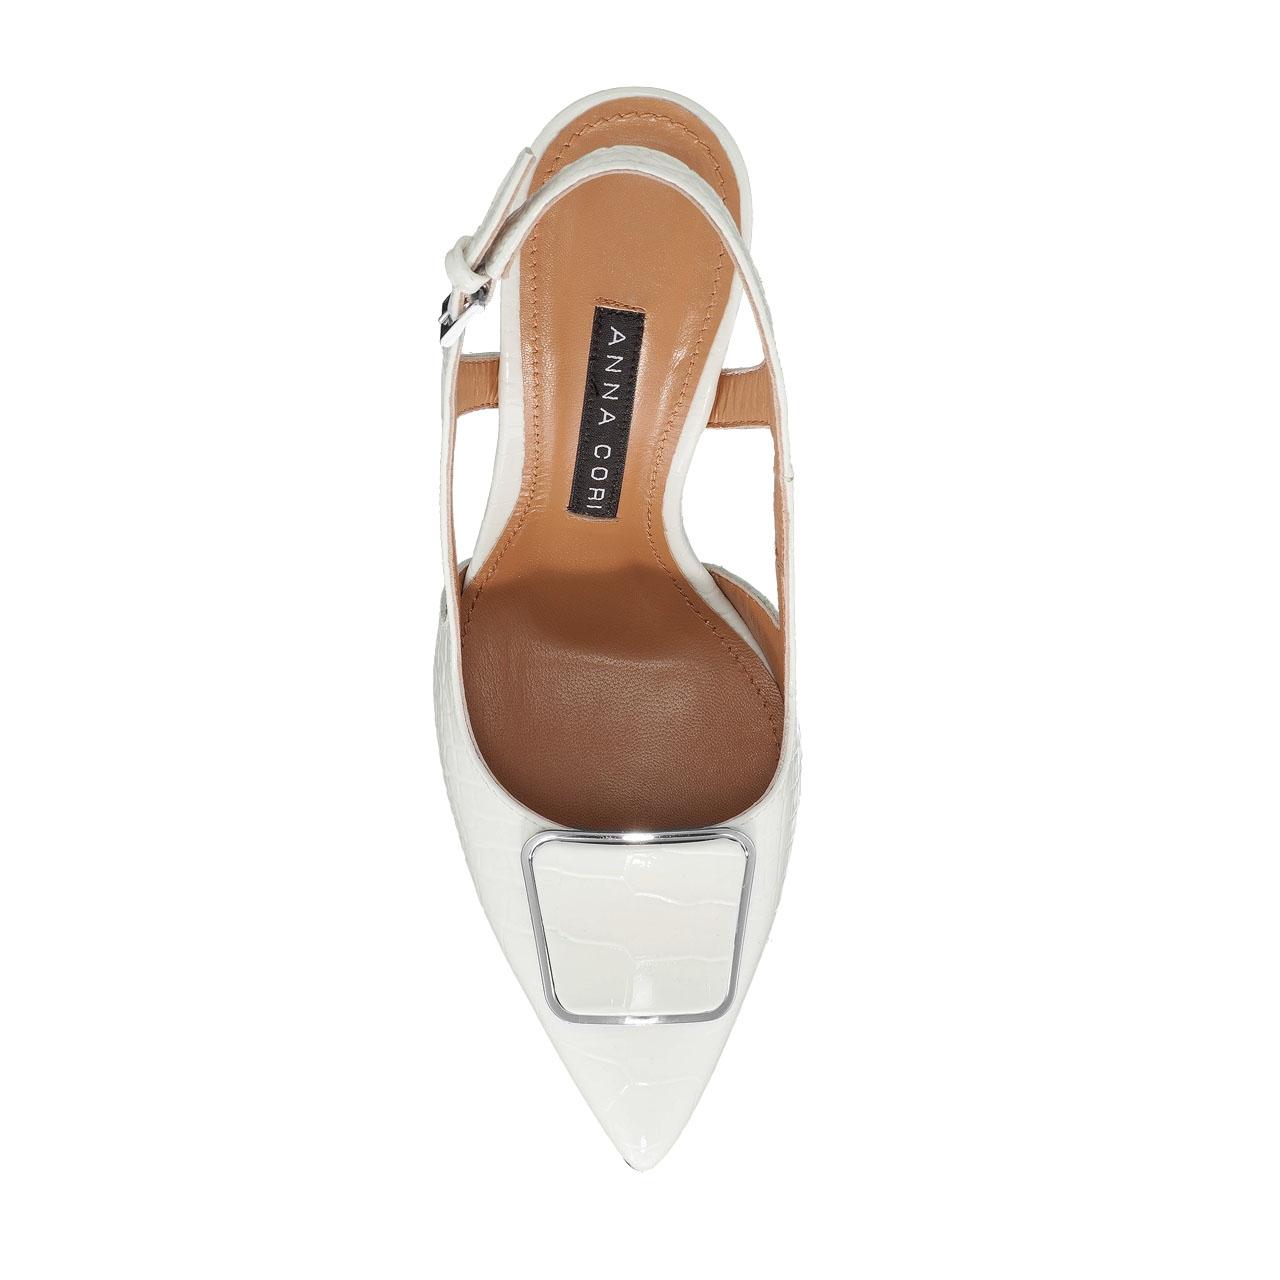 Imagine Pantofi Decupati Dama 5509 Croco Alb